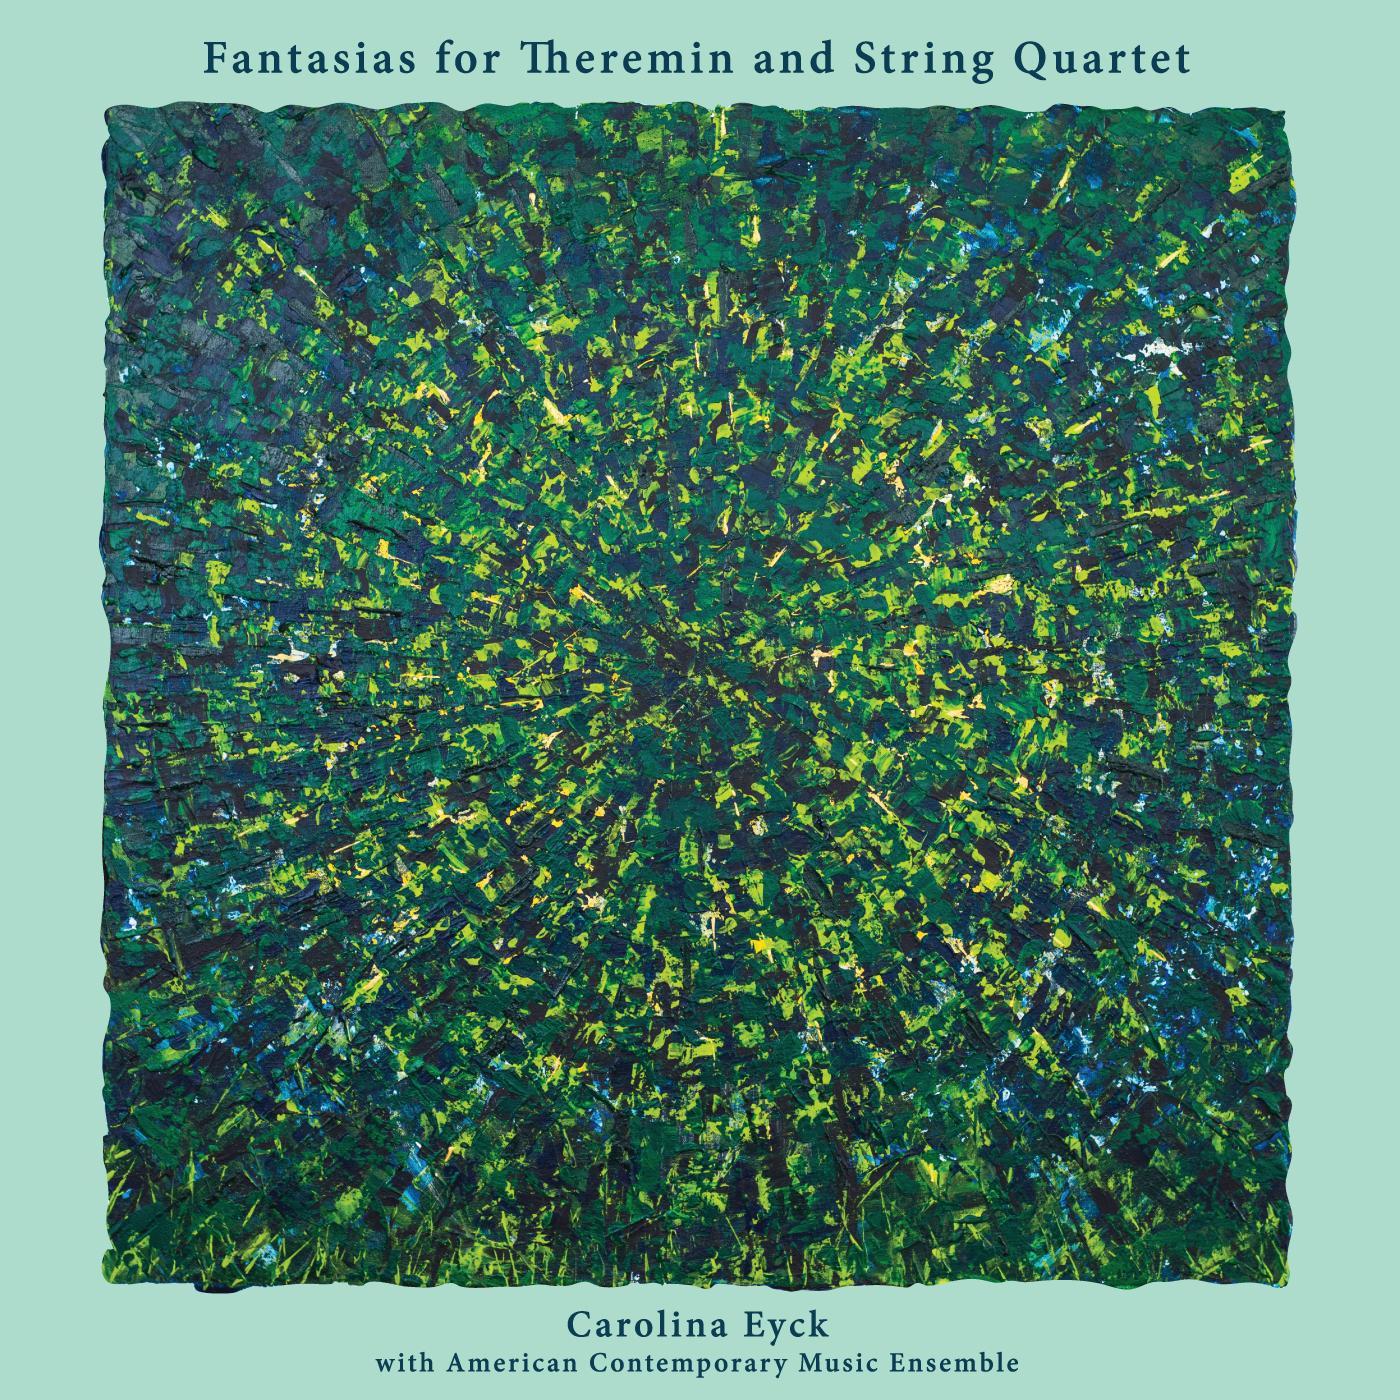 Fantasias for Theremin and String Quartet   Carolina Eyck with ACME  Vinyl LP, CD, Hi-Res Digital, Digital